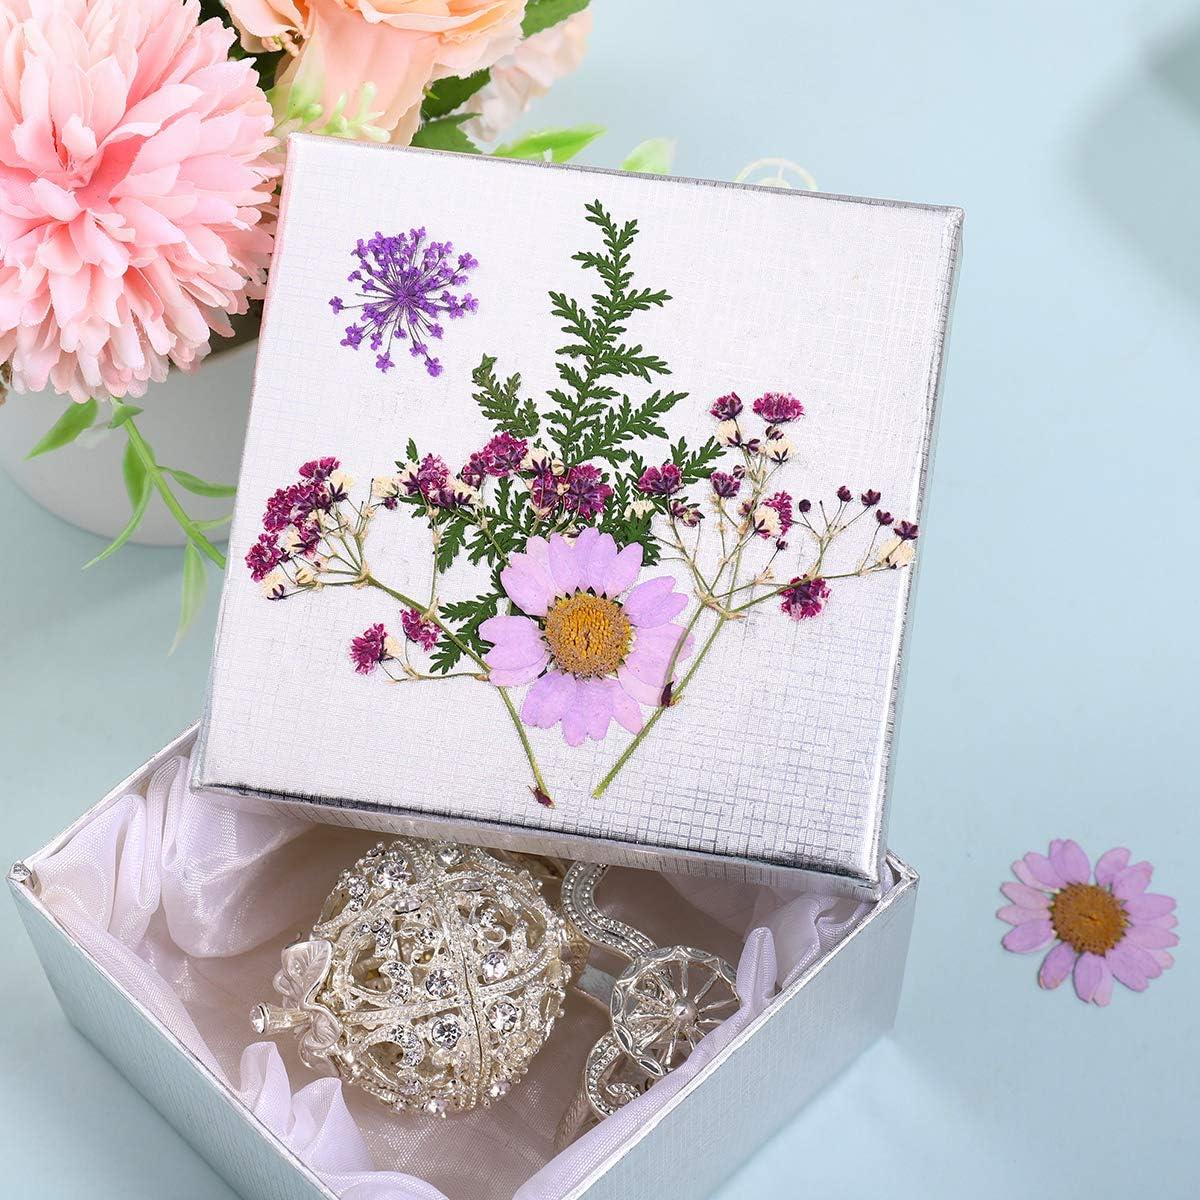 Real Dried Pressed Flowers, DIY Flower Pink Purple Larkspur Natural Pressed Flowers for Crafts Making, 30pcs